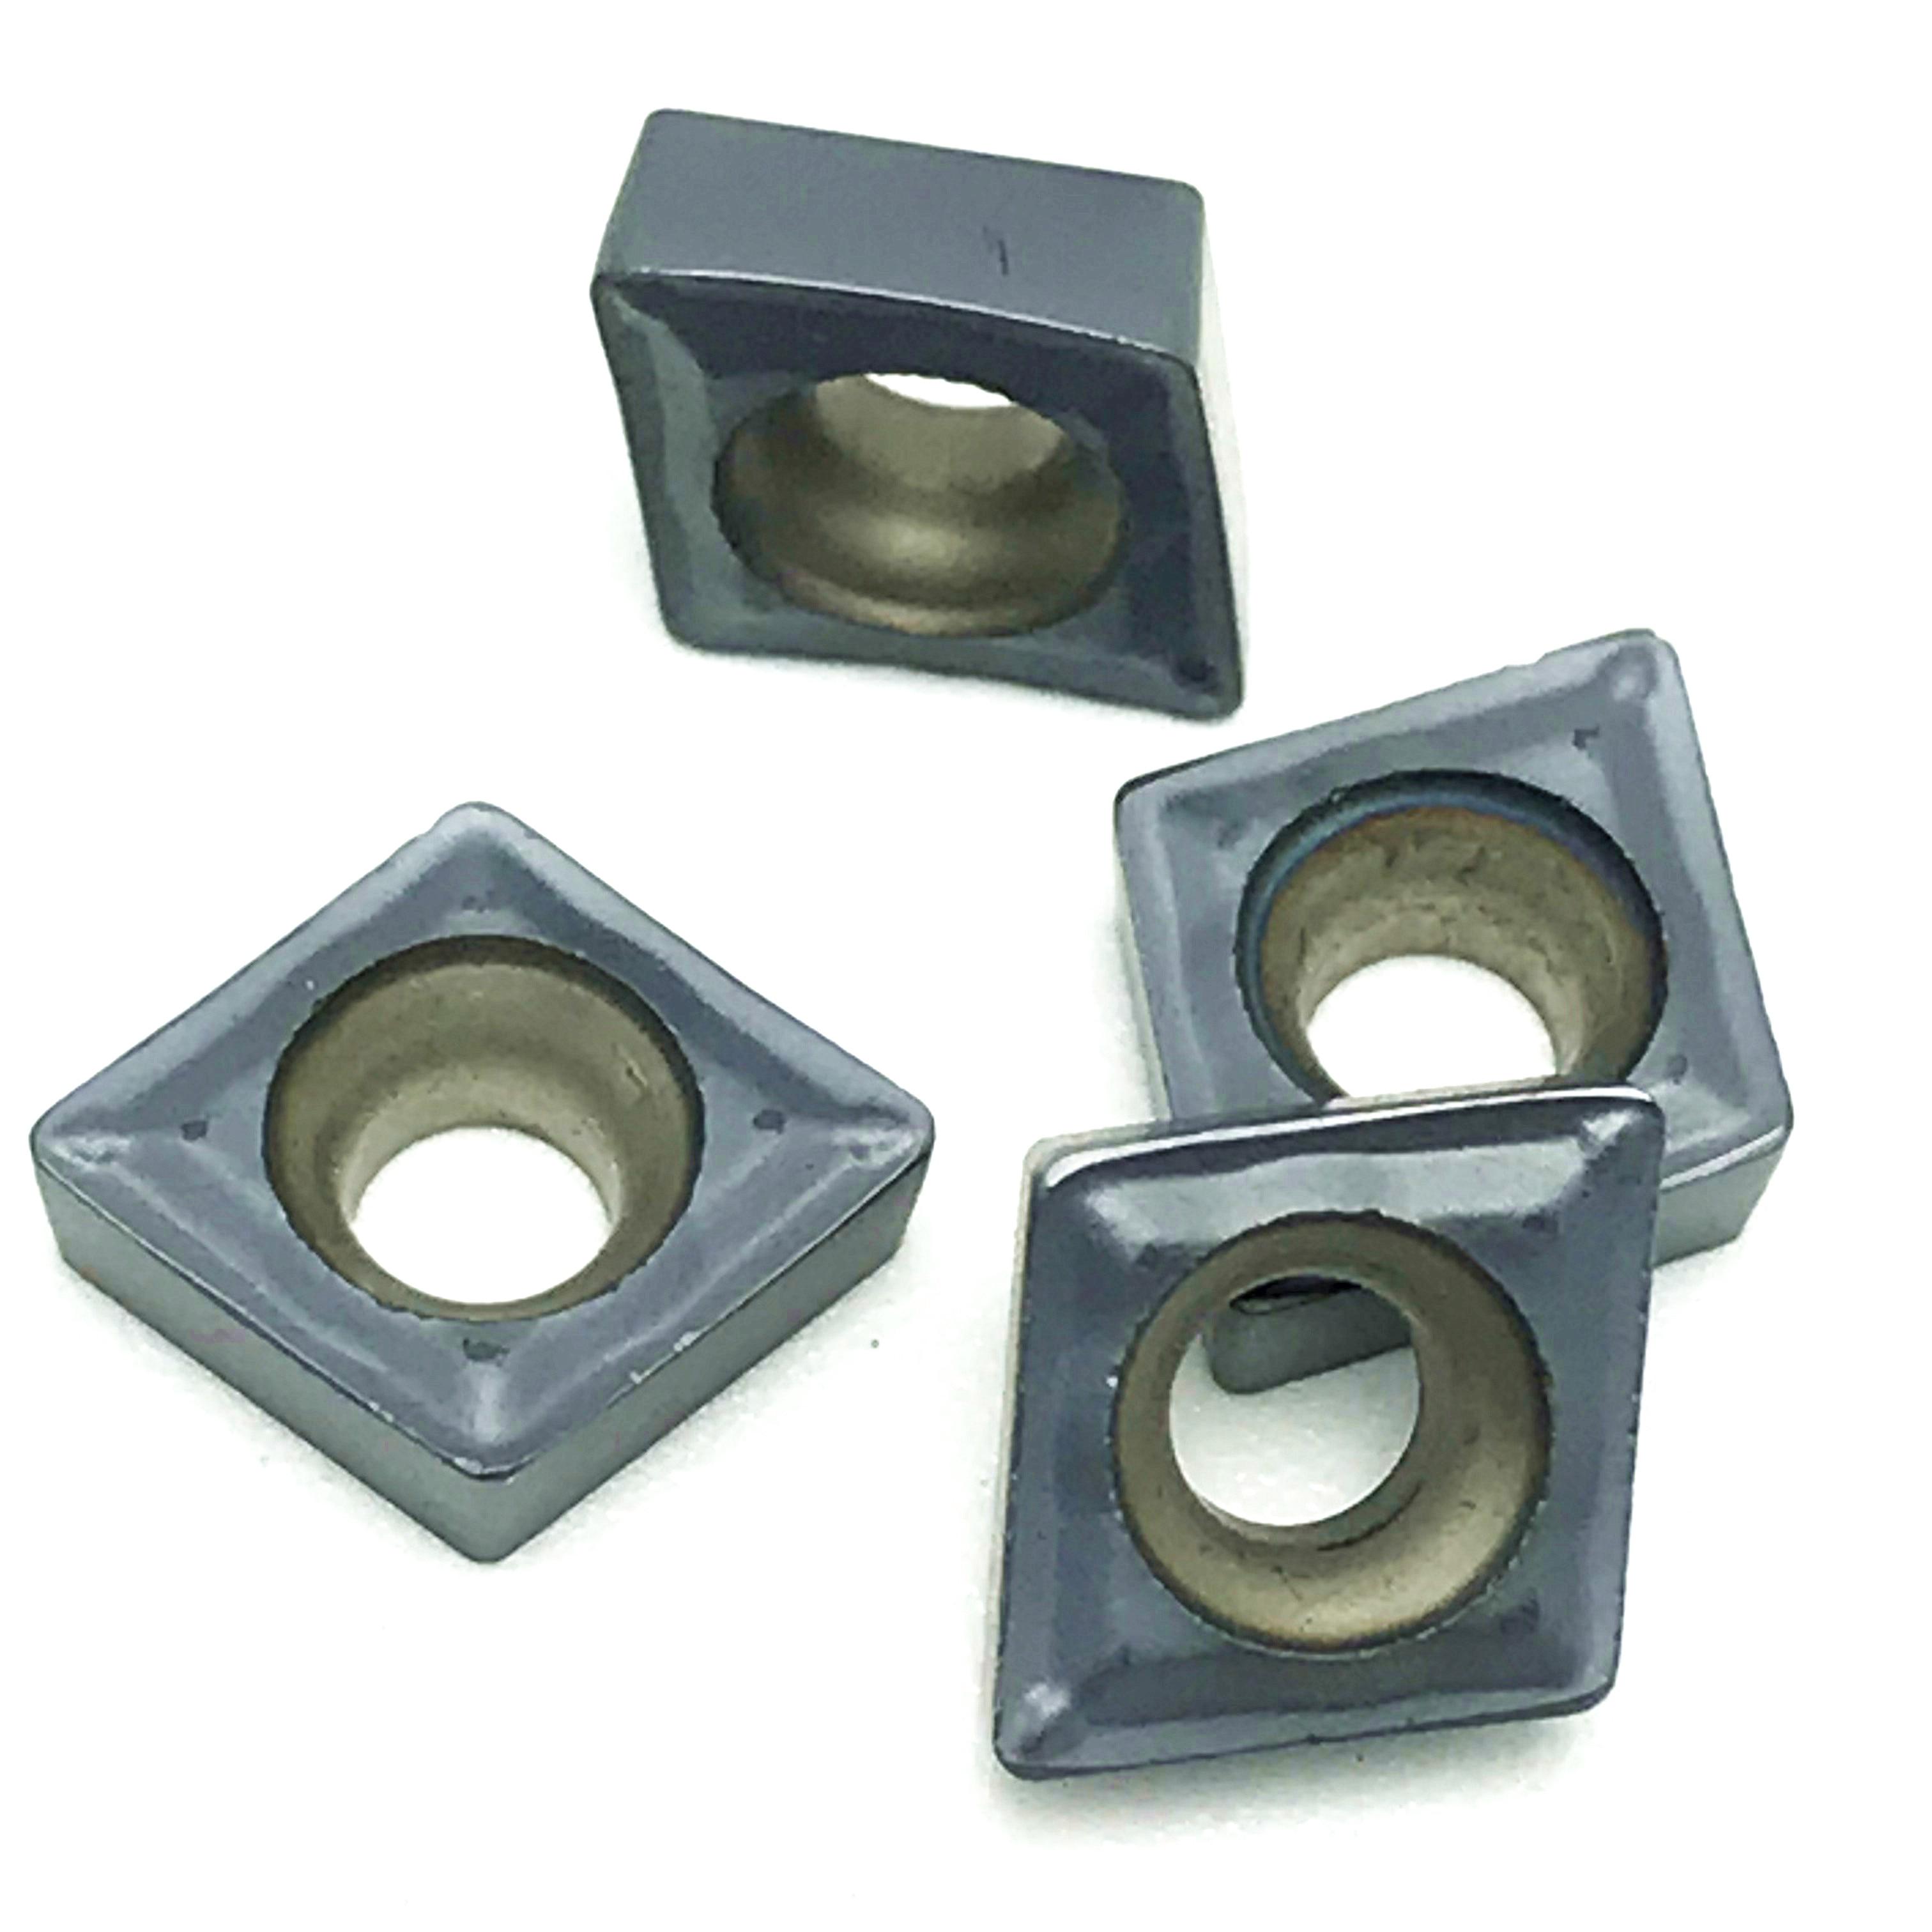 50PCS CCMT2-1-SM CCMT060204-SM IC907 High quality machining lathe Inserts